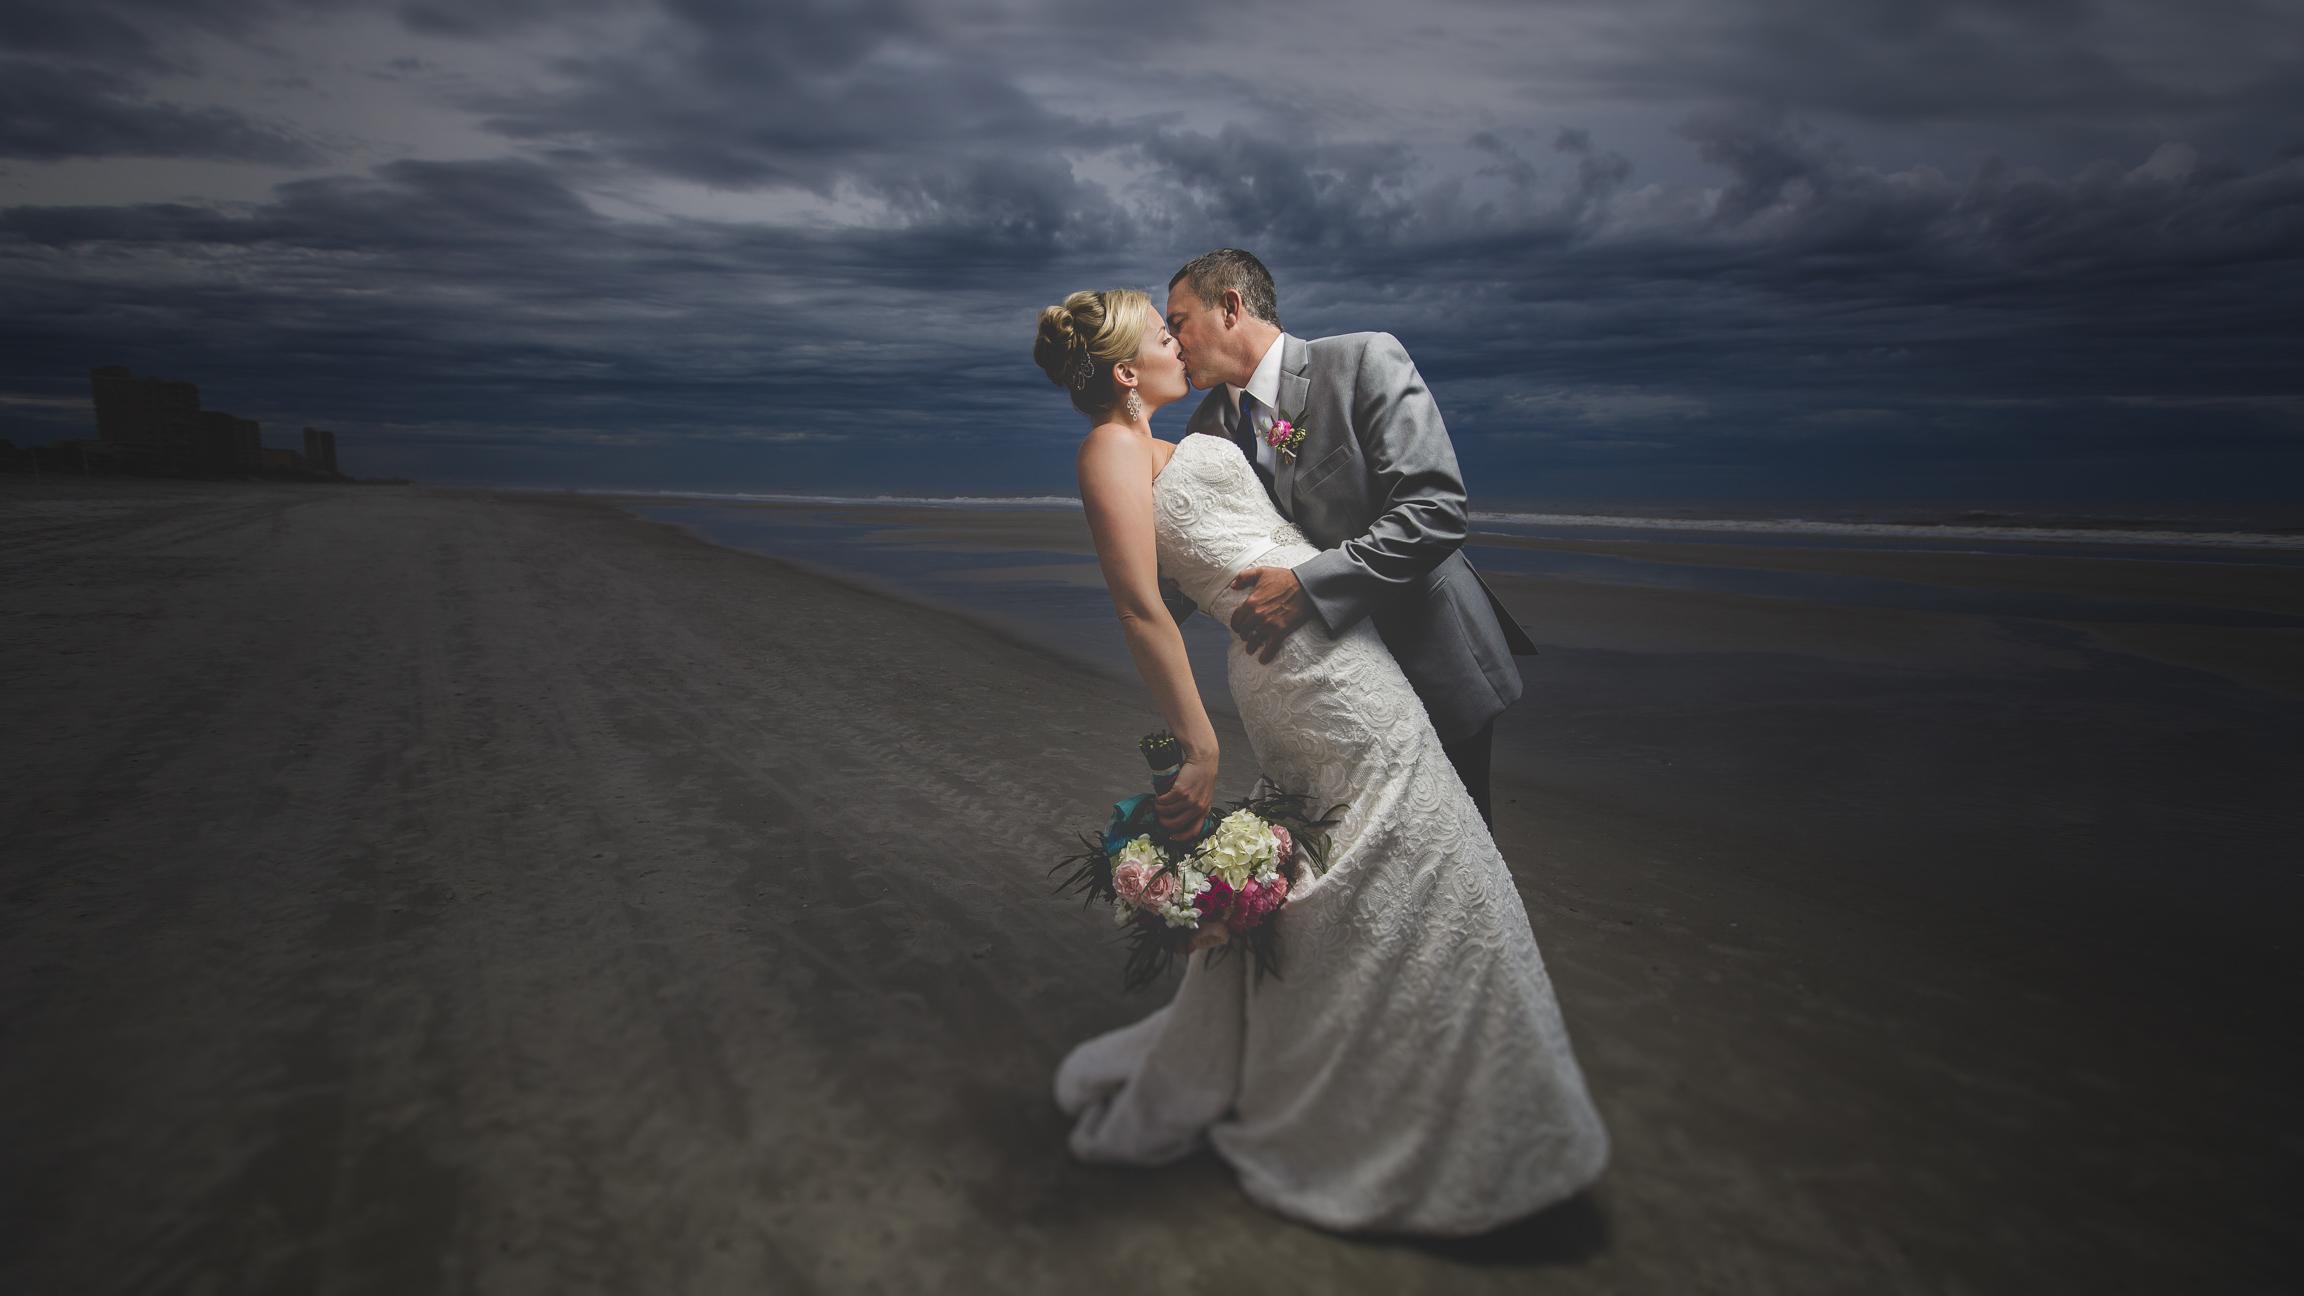 adam-szarmack-casa-marina-wedding-photographer-jacksonville-beach-florida-41.jpg